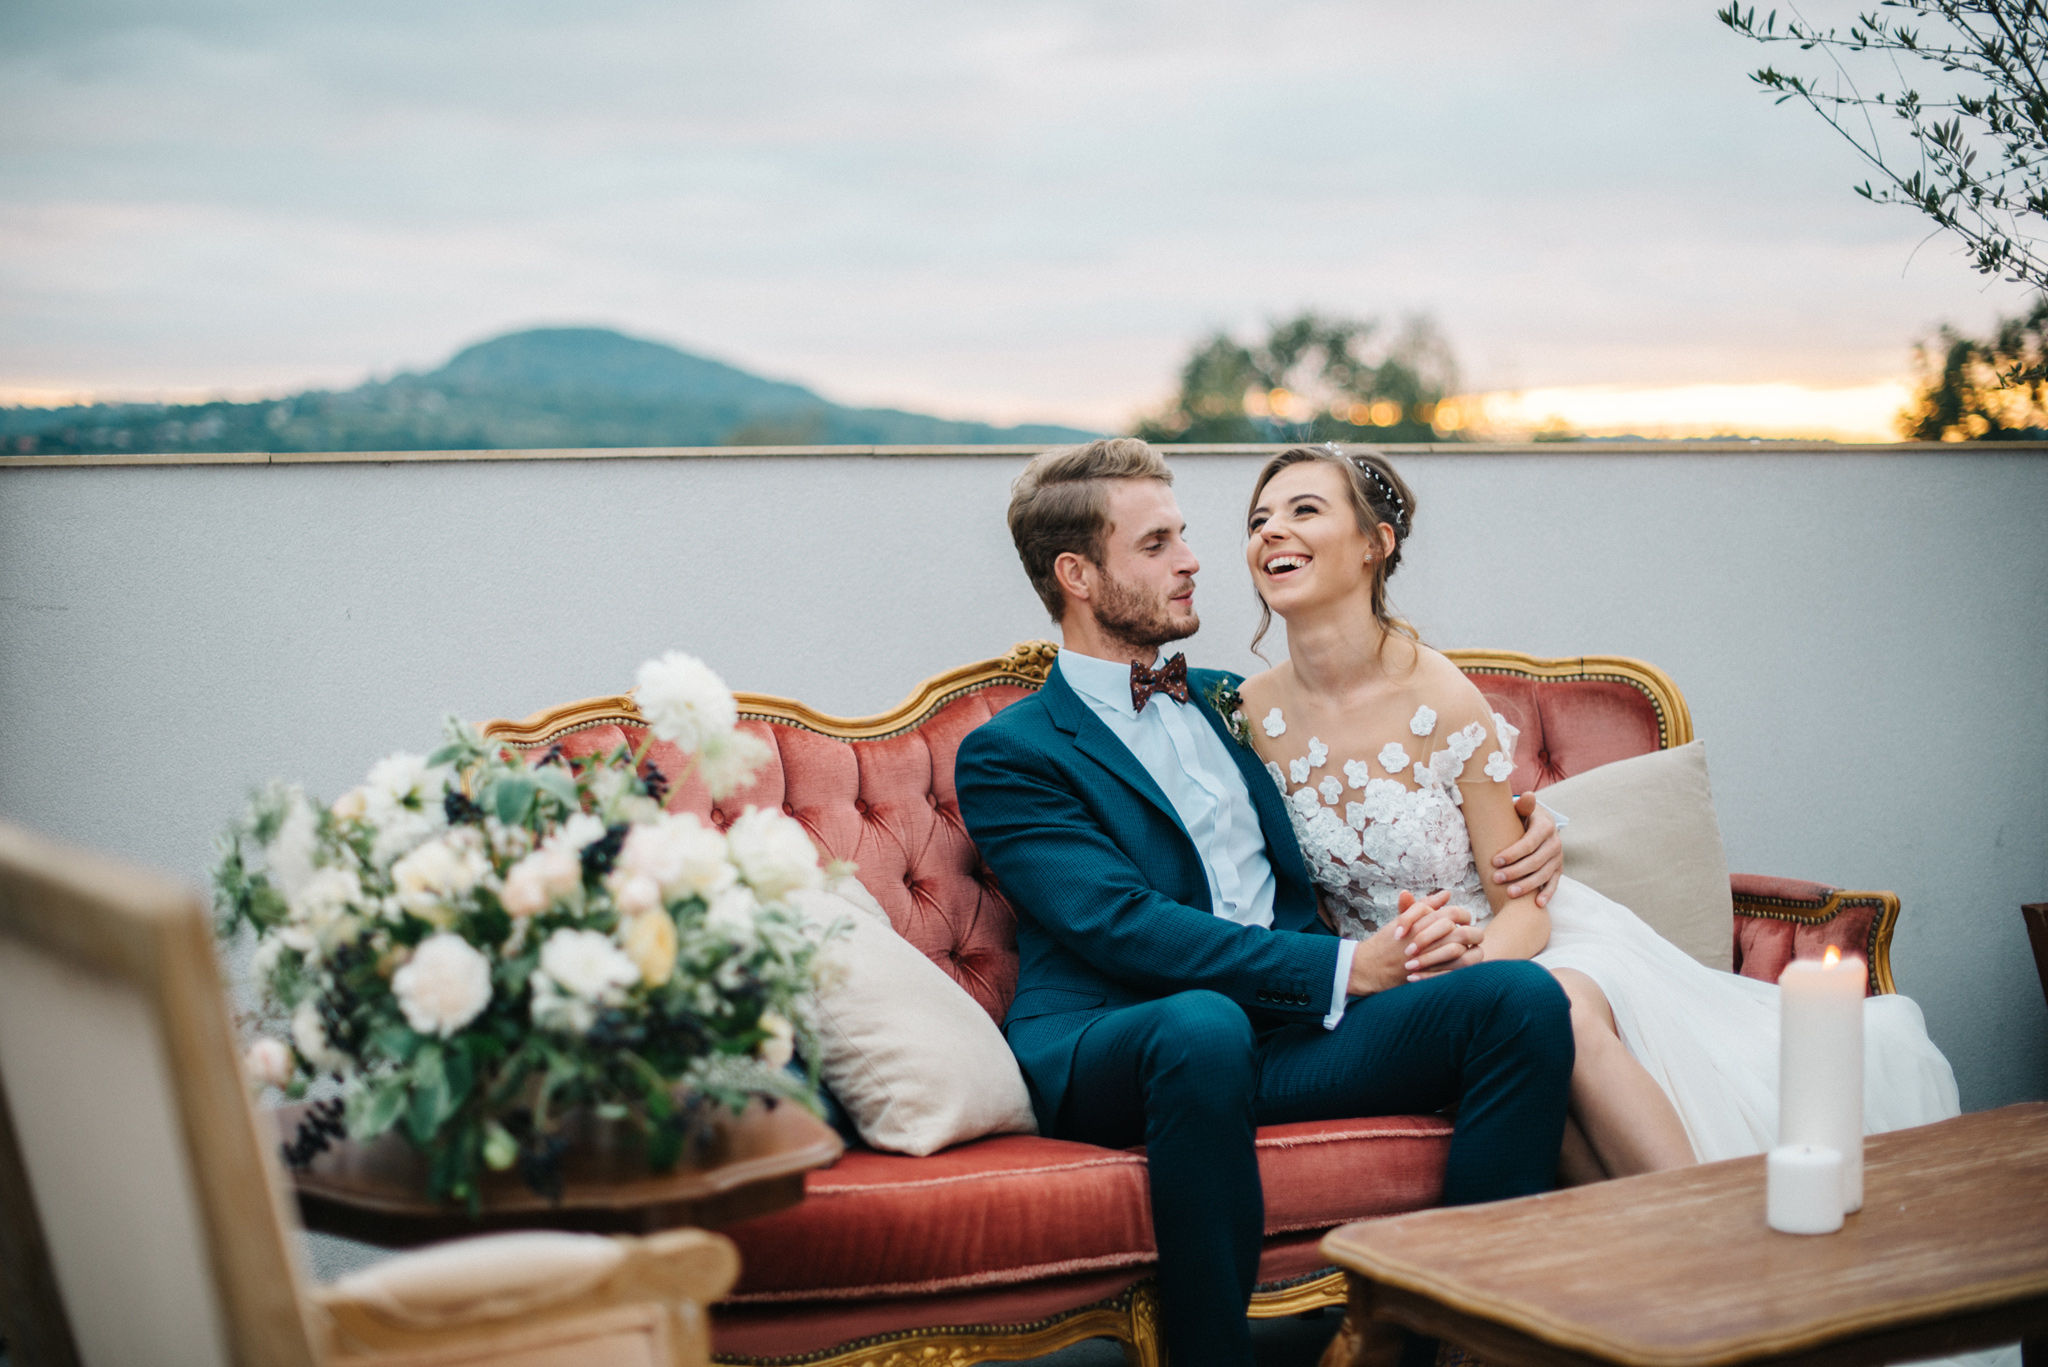 brideside_elitewedding_264_fulrez